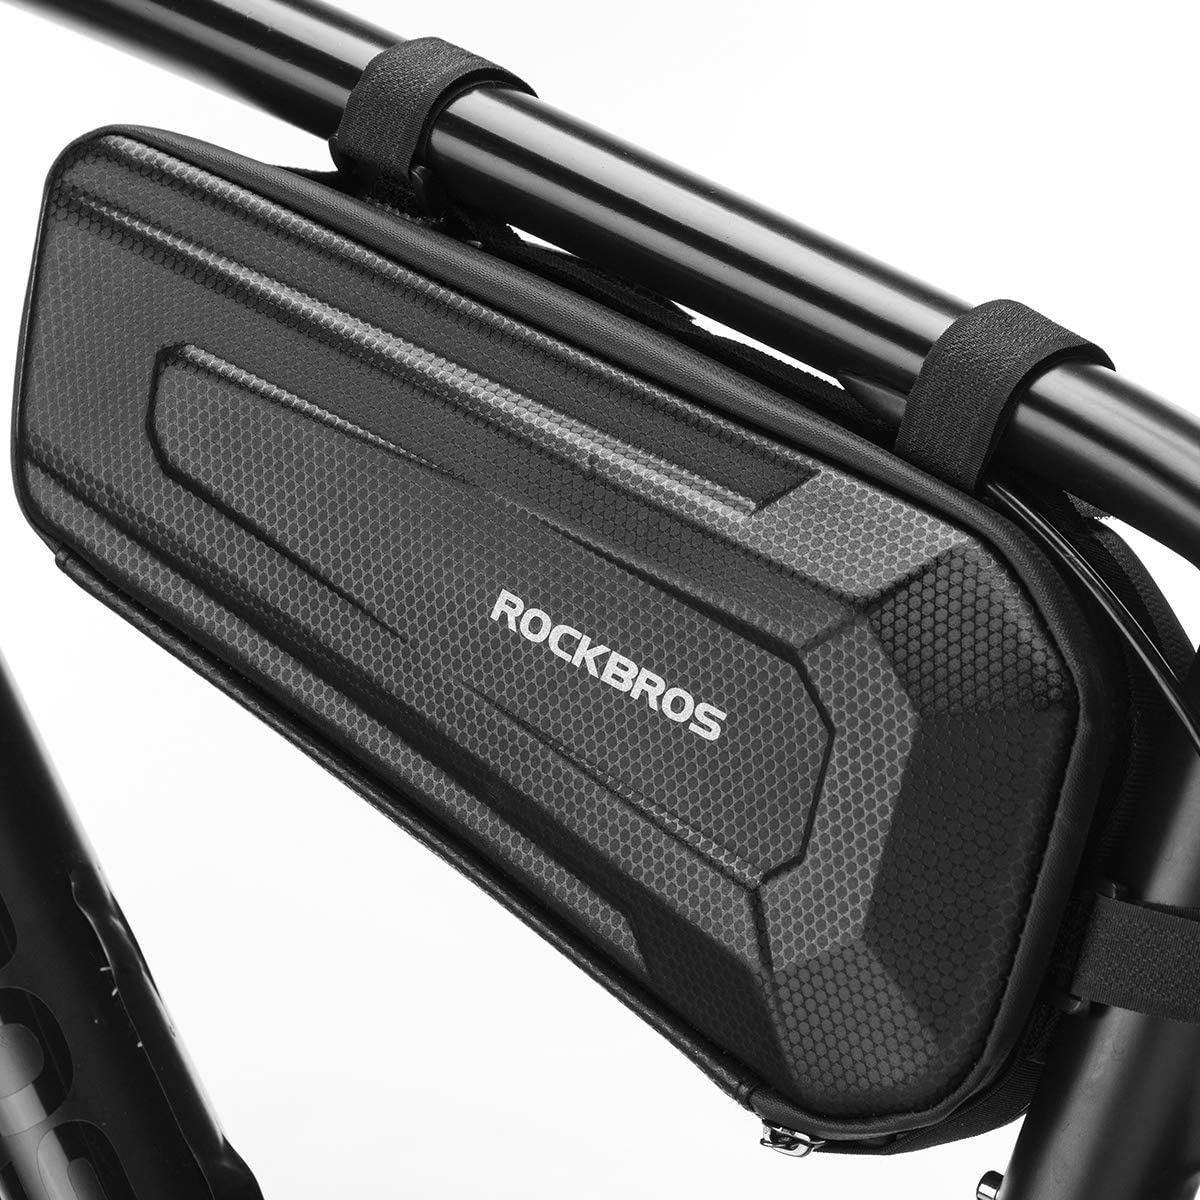 ROCKBROS Bike Frame Bag Bicycle Triangle Bag Front Frame Top Tube Bag Water Resistant Large Capacity Storage Bag for Mountain Bikes E-bikes Racing Bikes 2.5L//1.5L